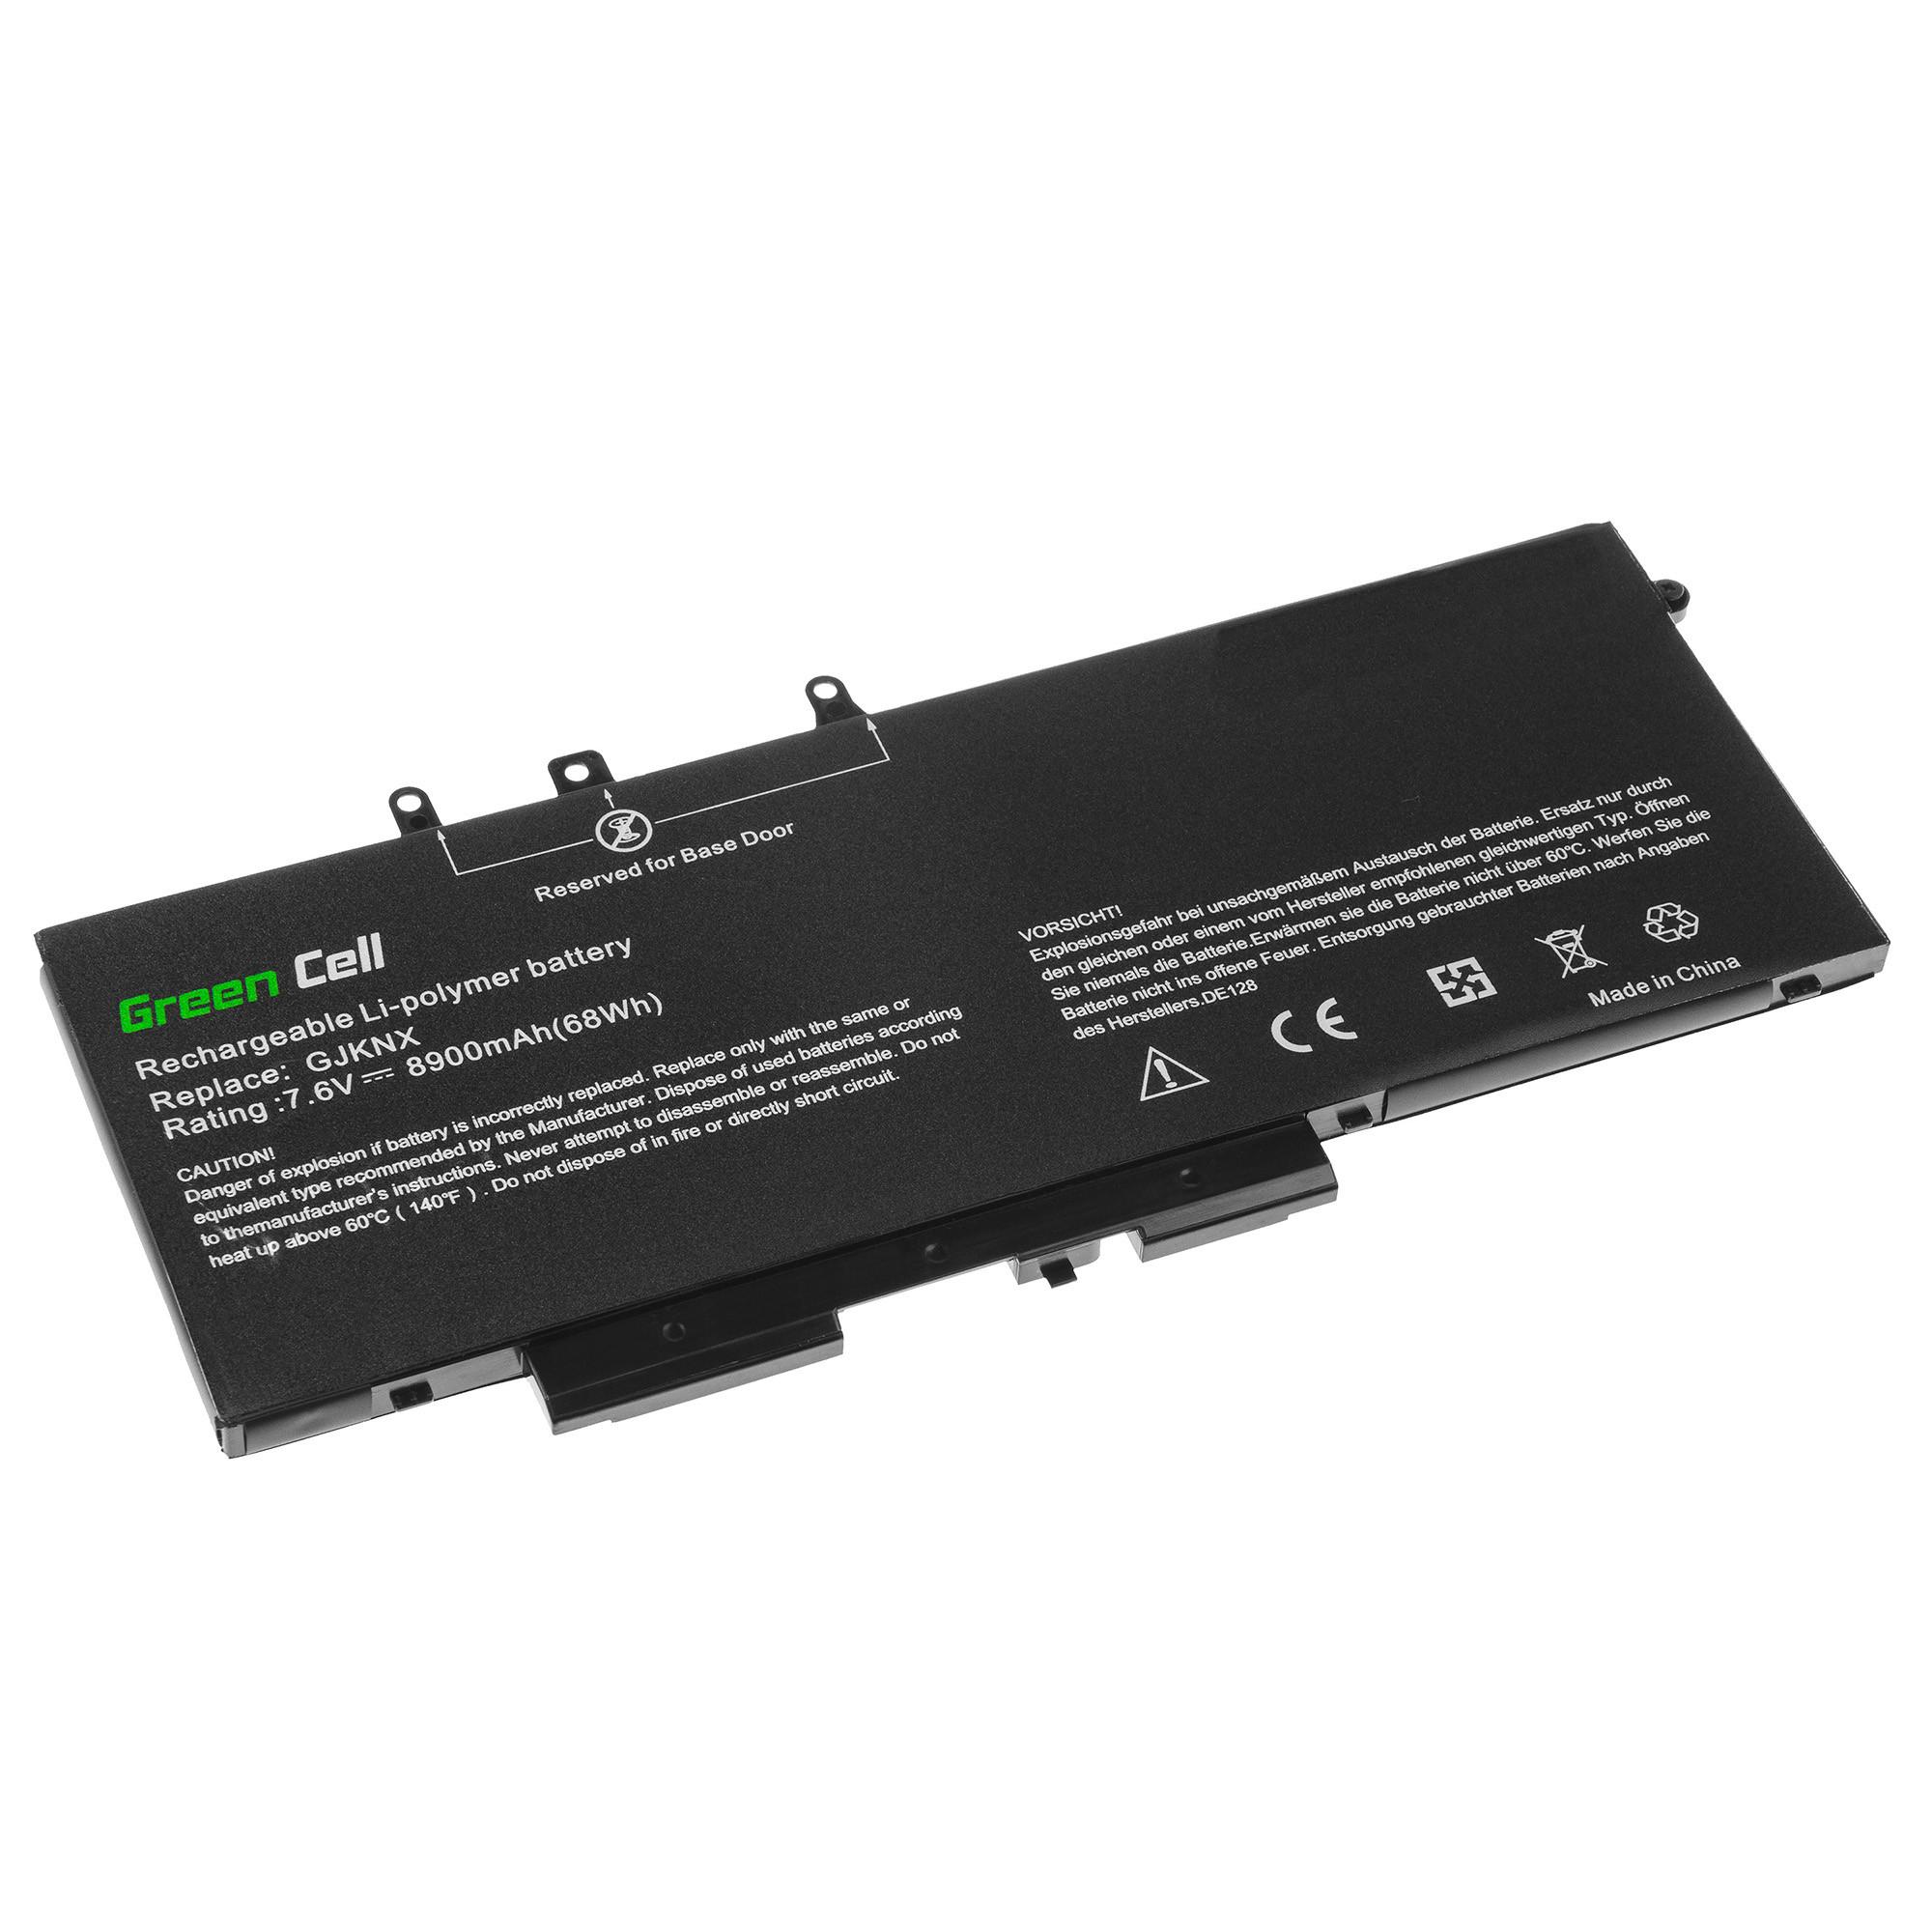 Green Cell DE128 Baterie Dell 93FTF GJKNX, Dell Latitude 5280 5290 5480 5490 5491 5495 5580 5590 5591 Precision 3520 3530 8900mAh Li-Pol – neoriginální